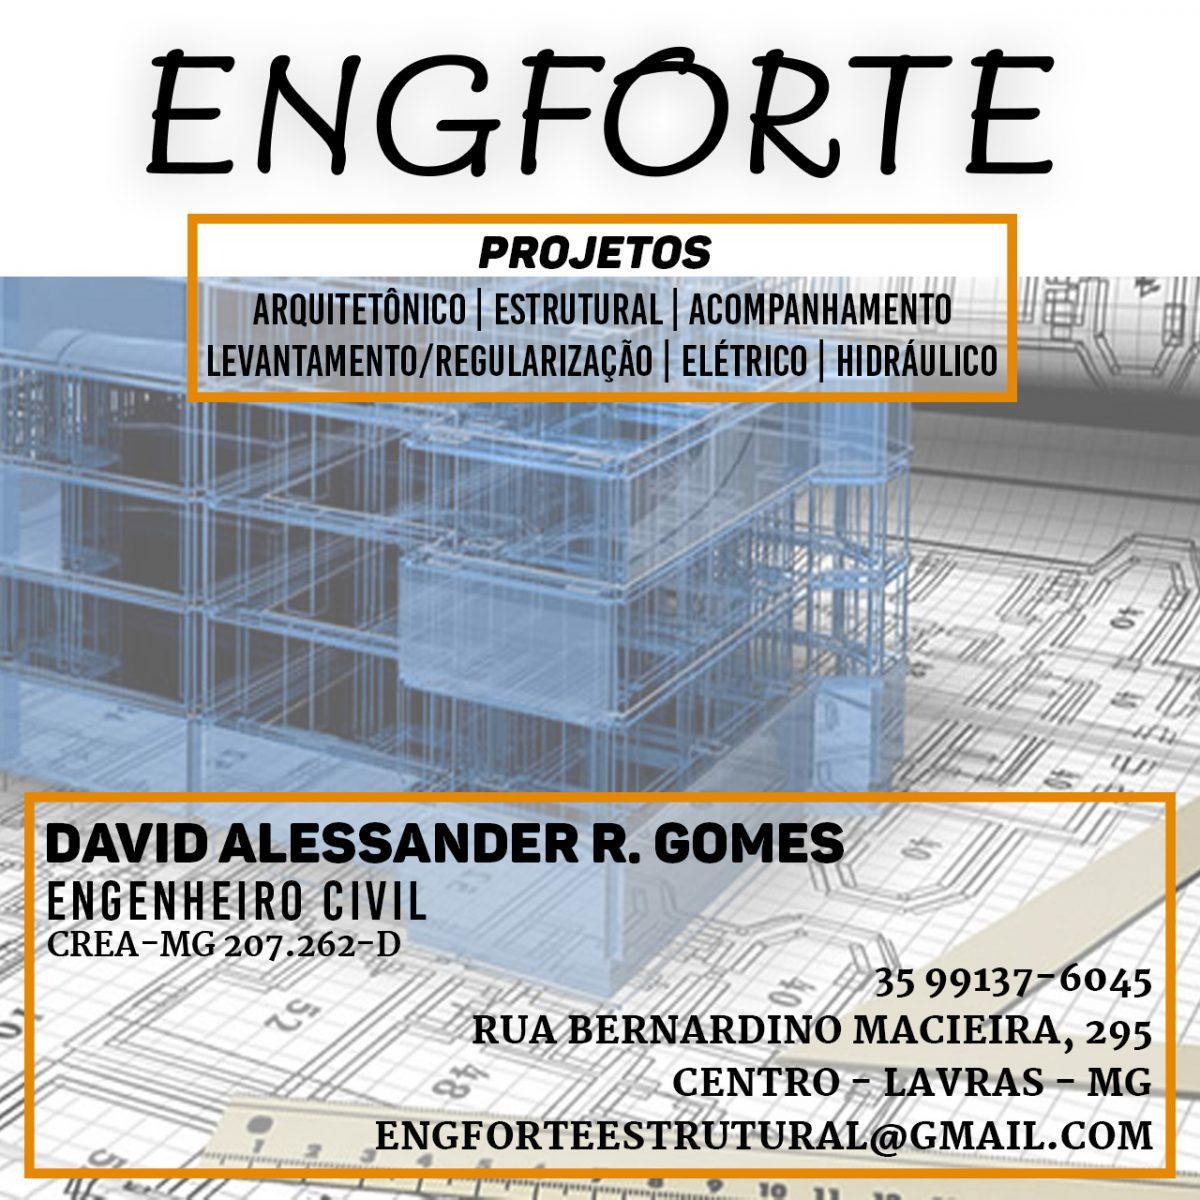 ENGFORTE